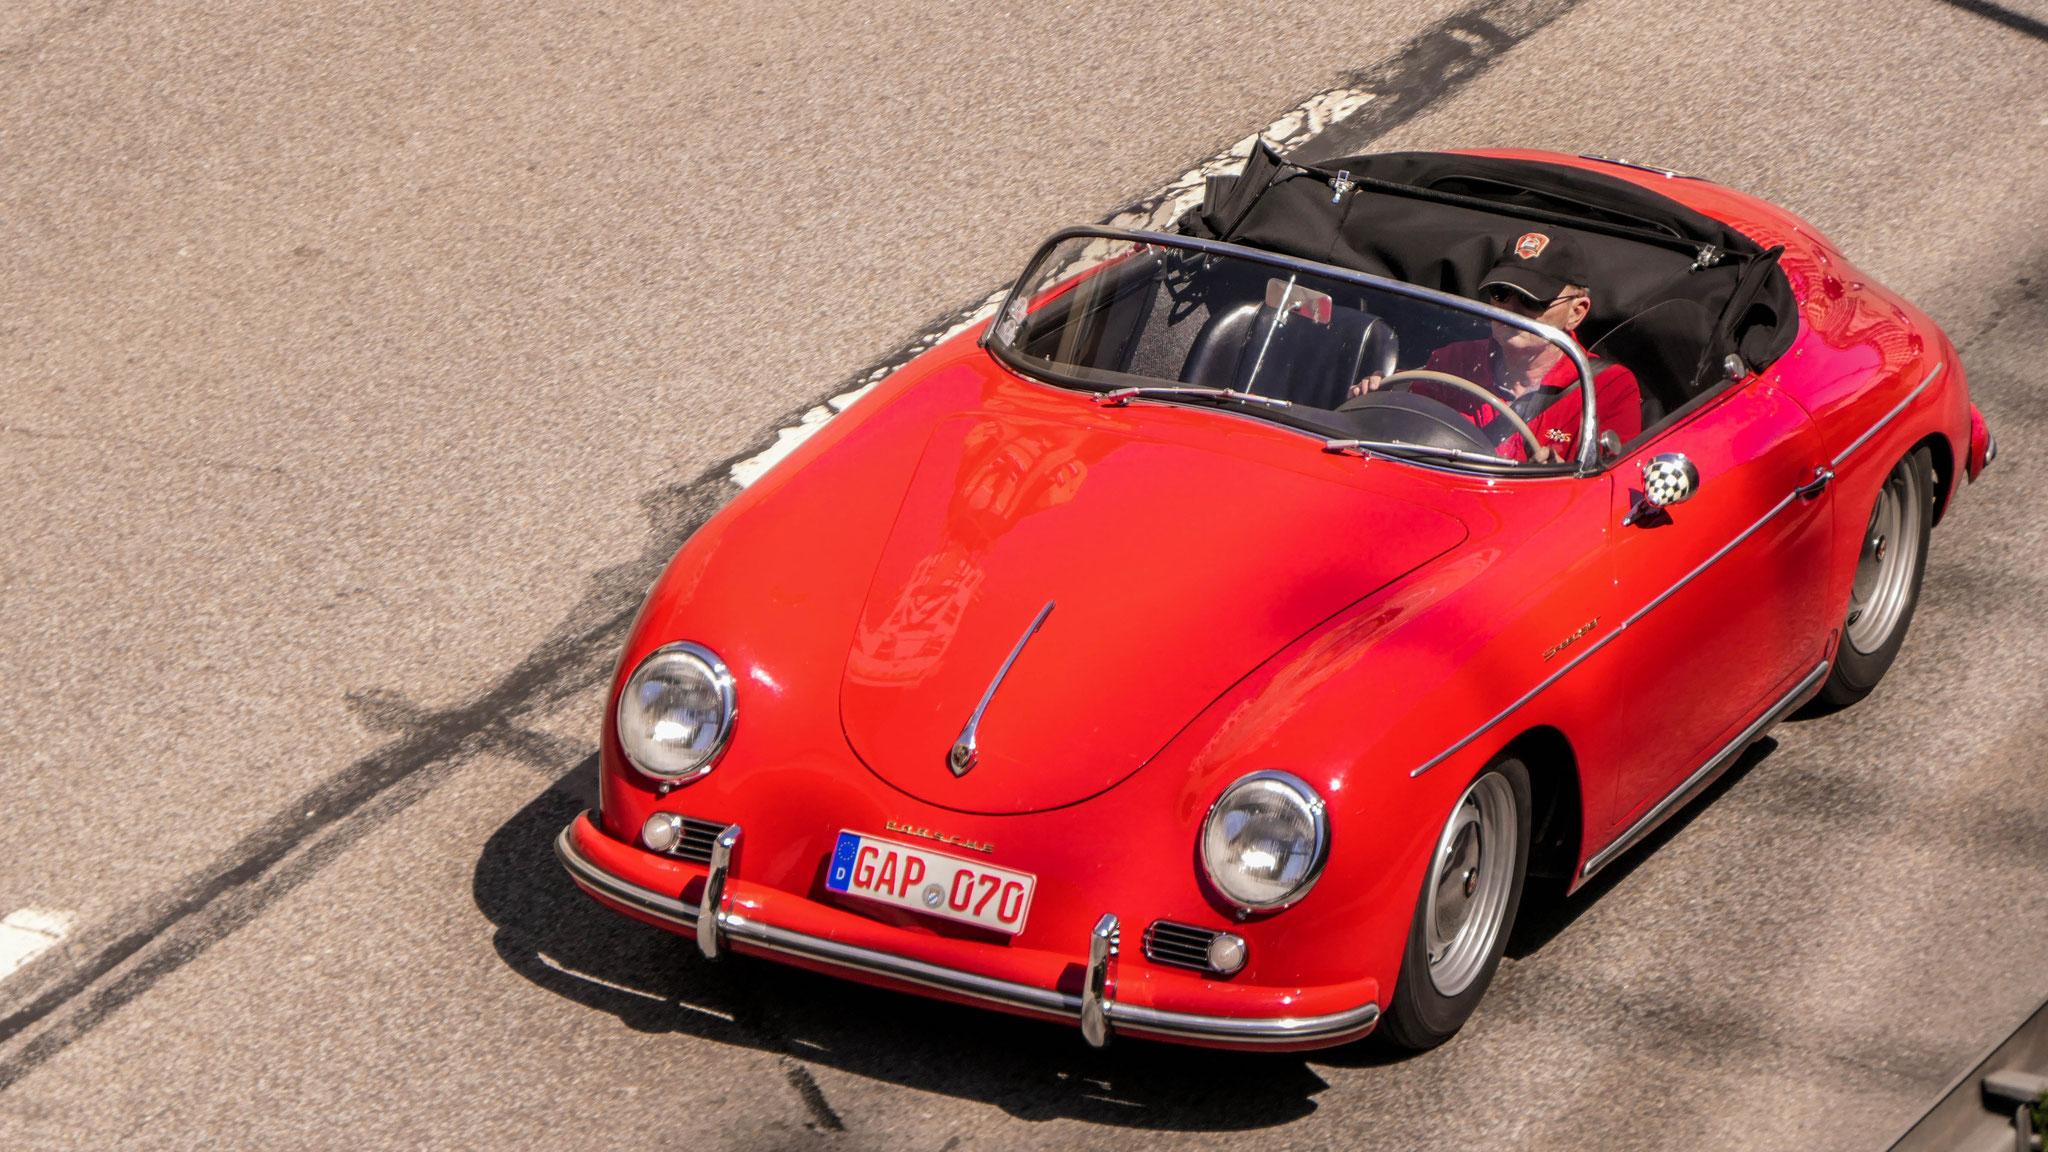 Porsche 356 1500 Speedster - GAP-070